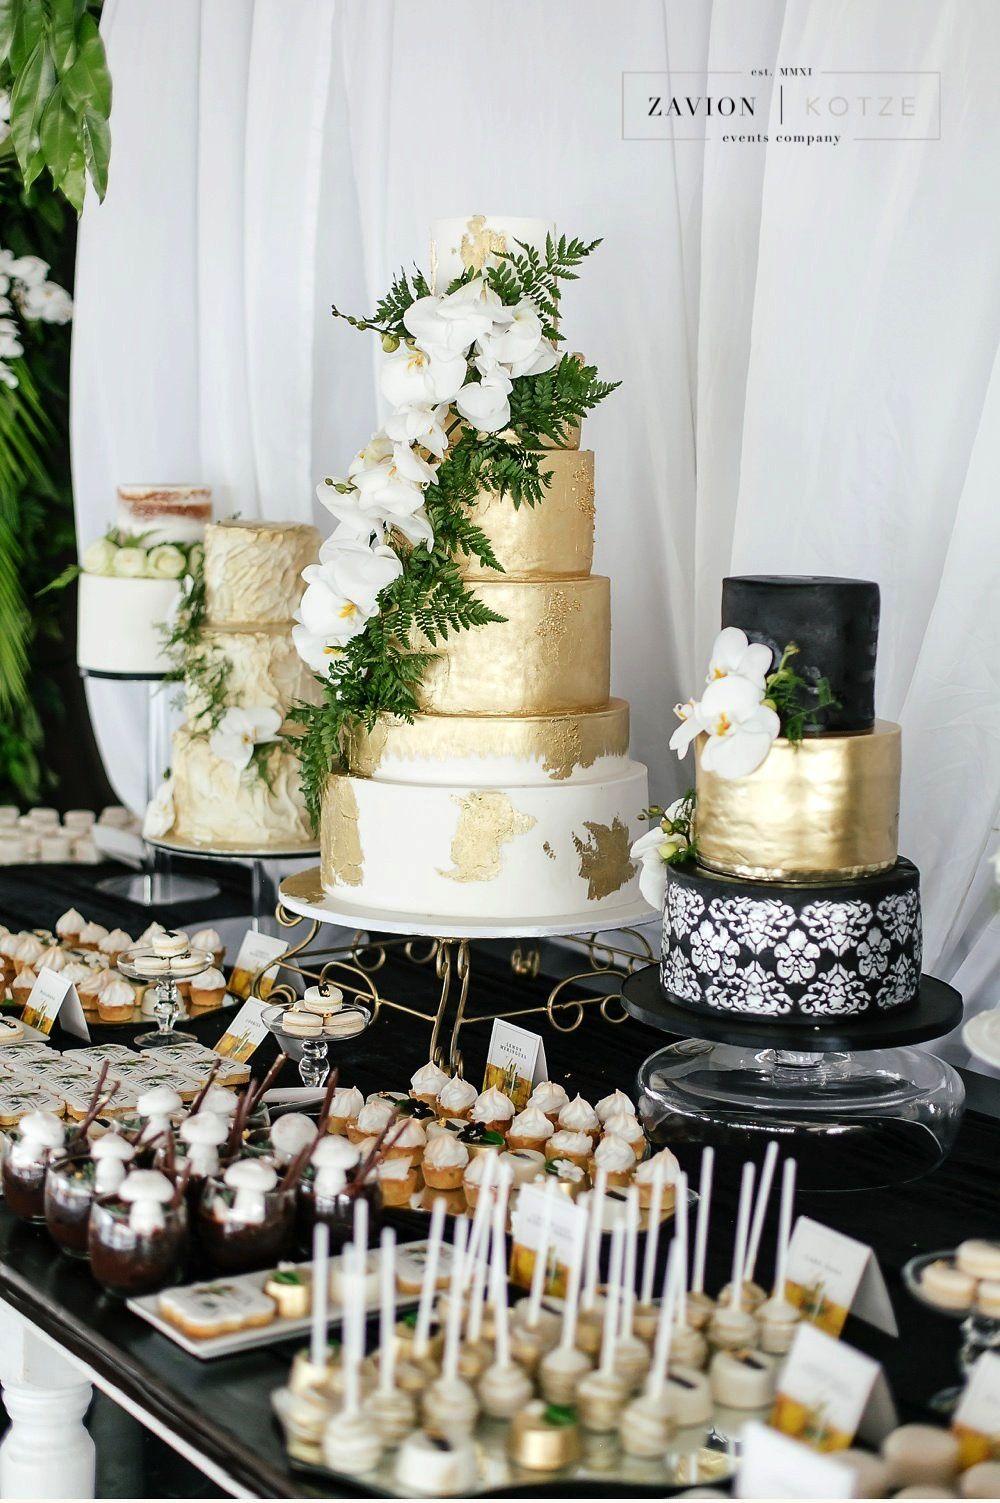 Wedding Cake Green Gold Black And White Wedding Cake Cake By